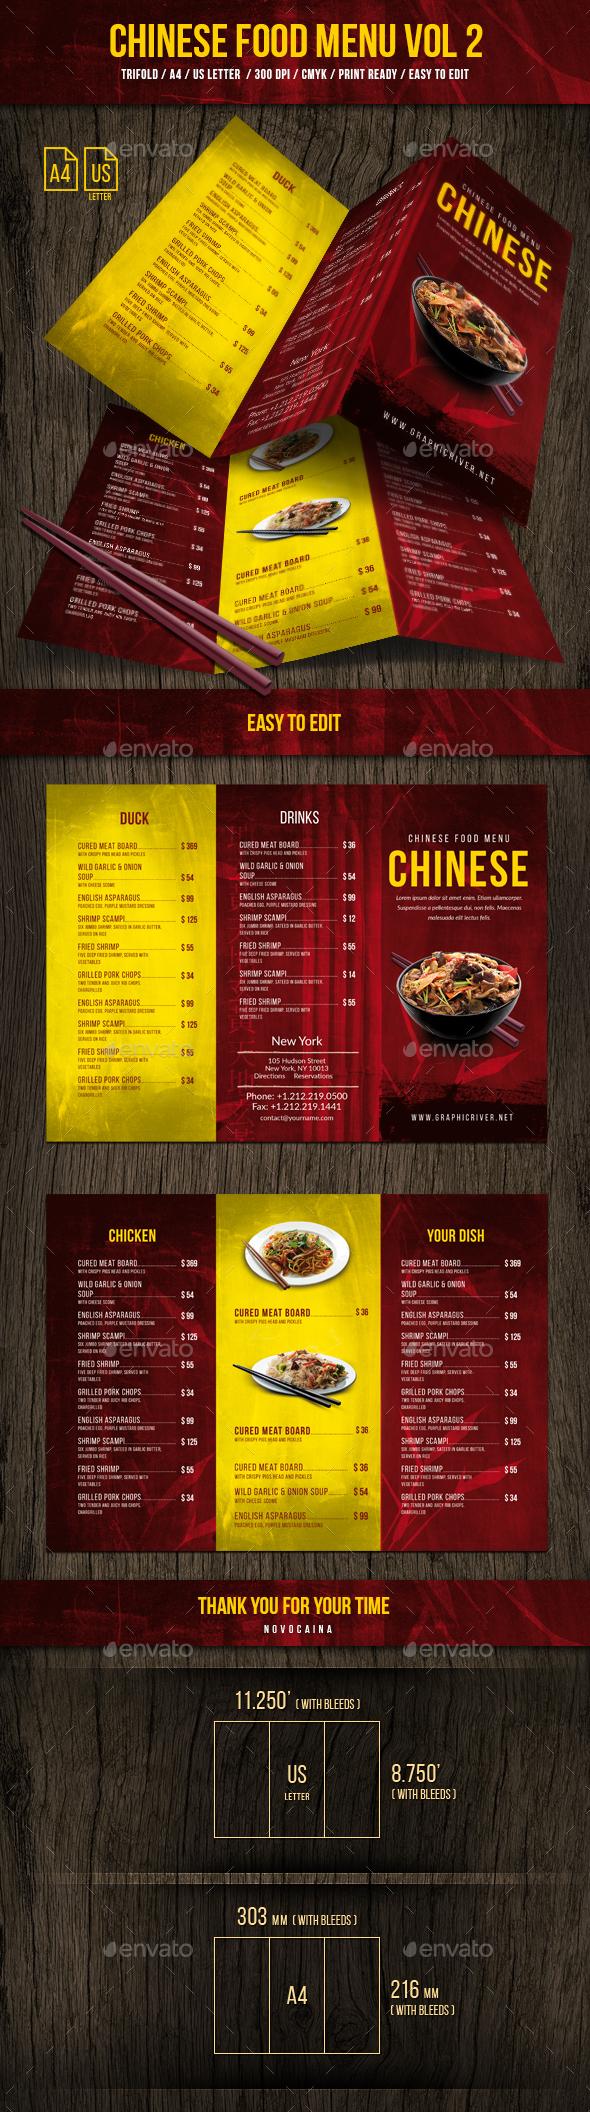 Chinese A4 & US Letter Trifold Food Menu Vol 2 - Food Menus Print Templates